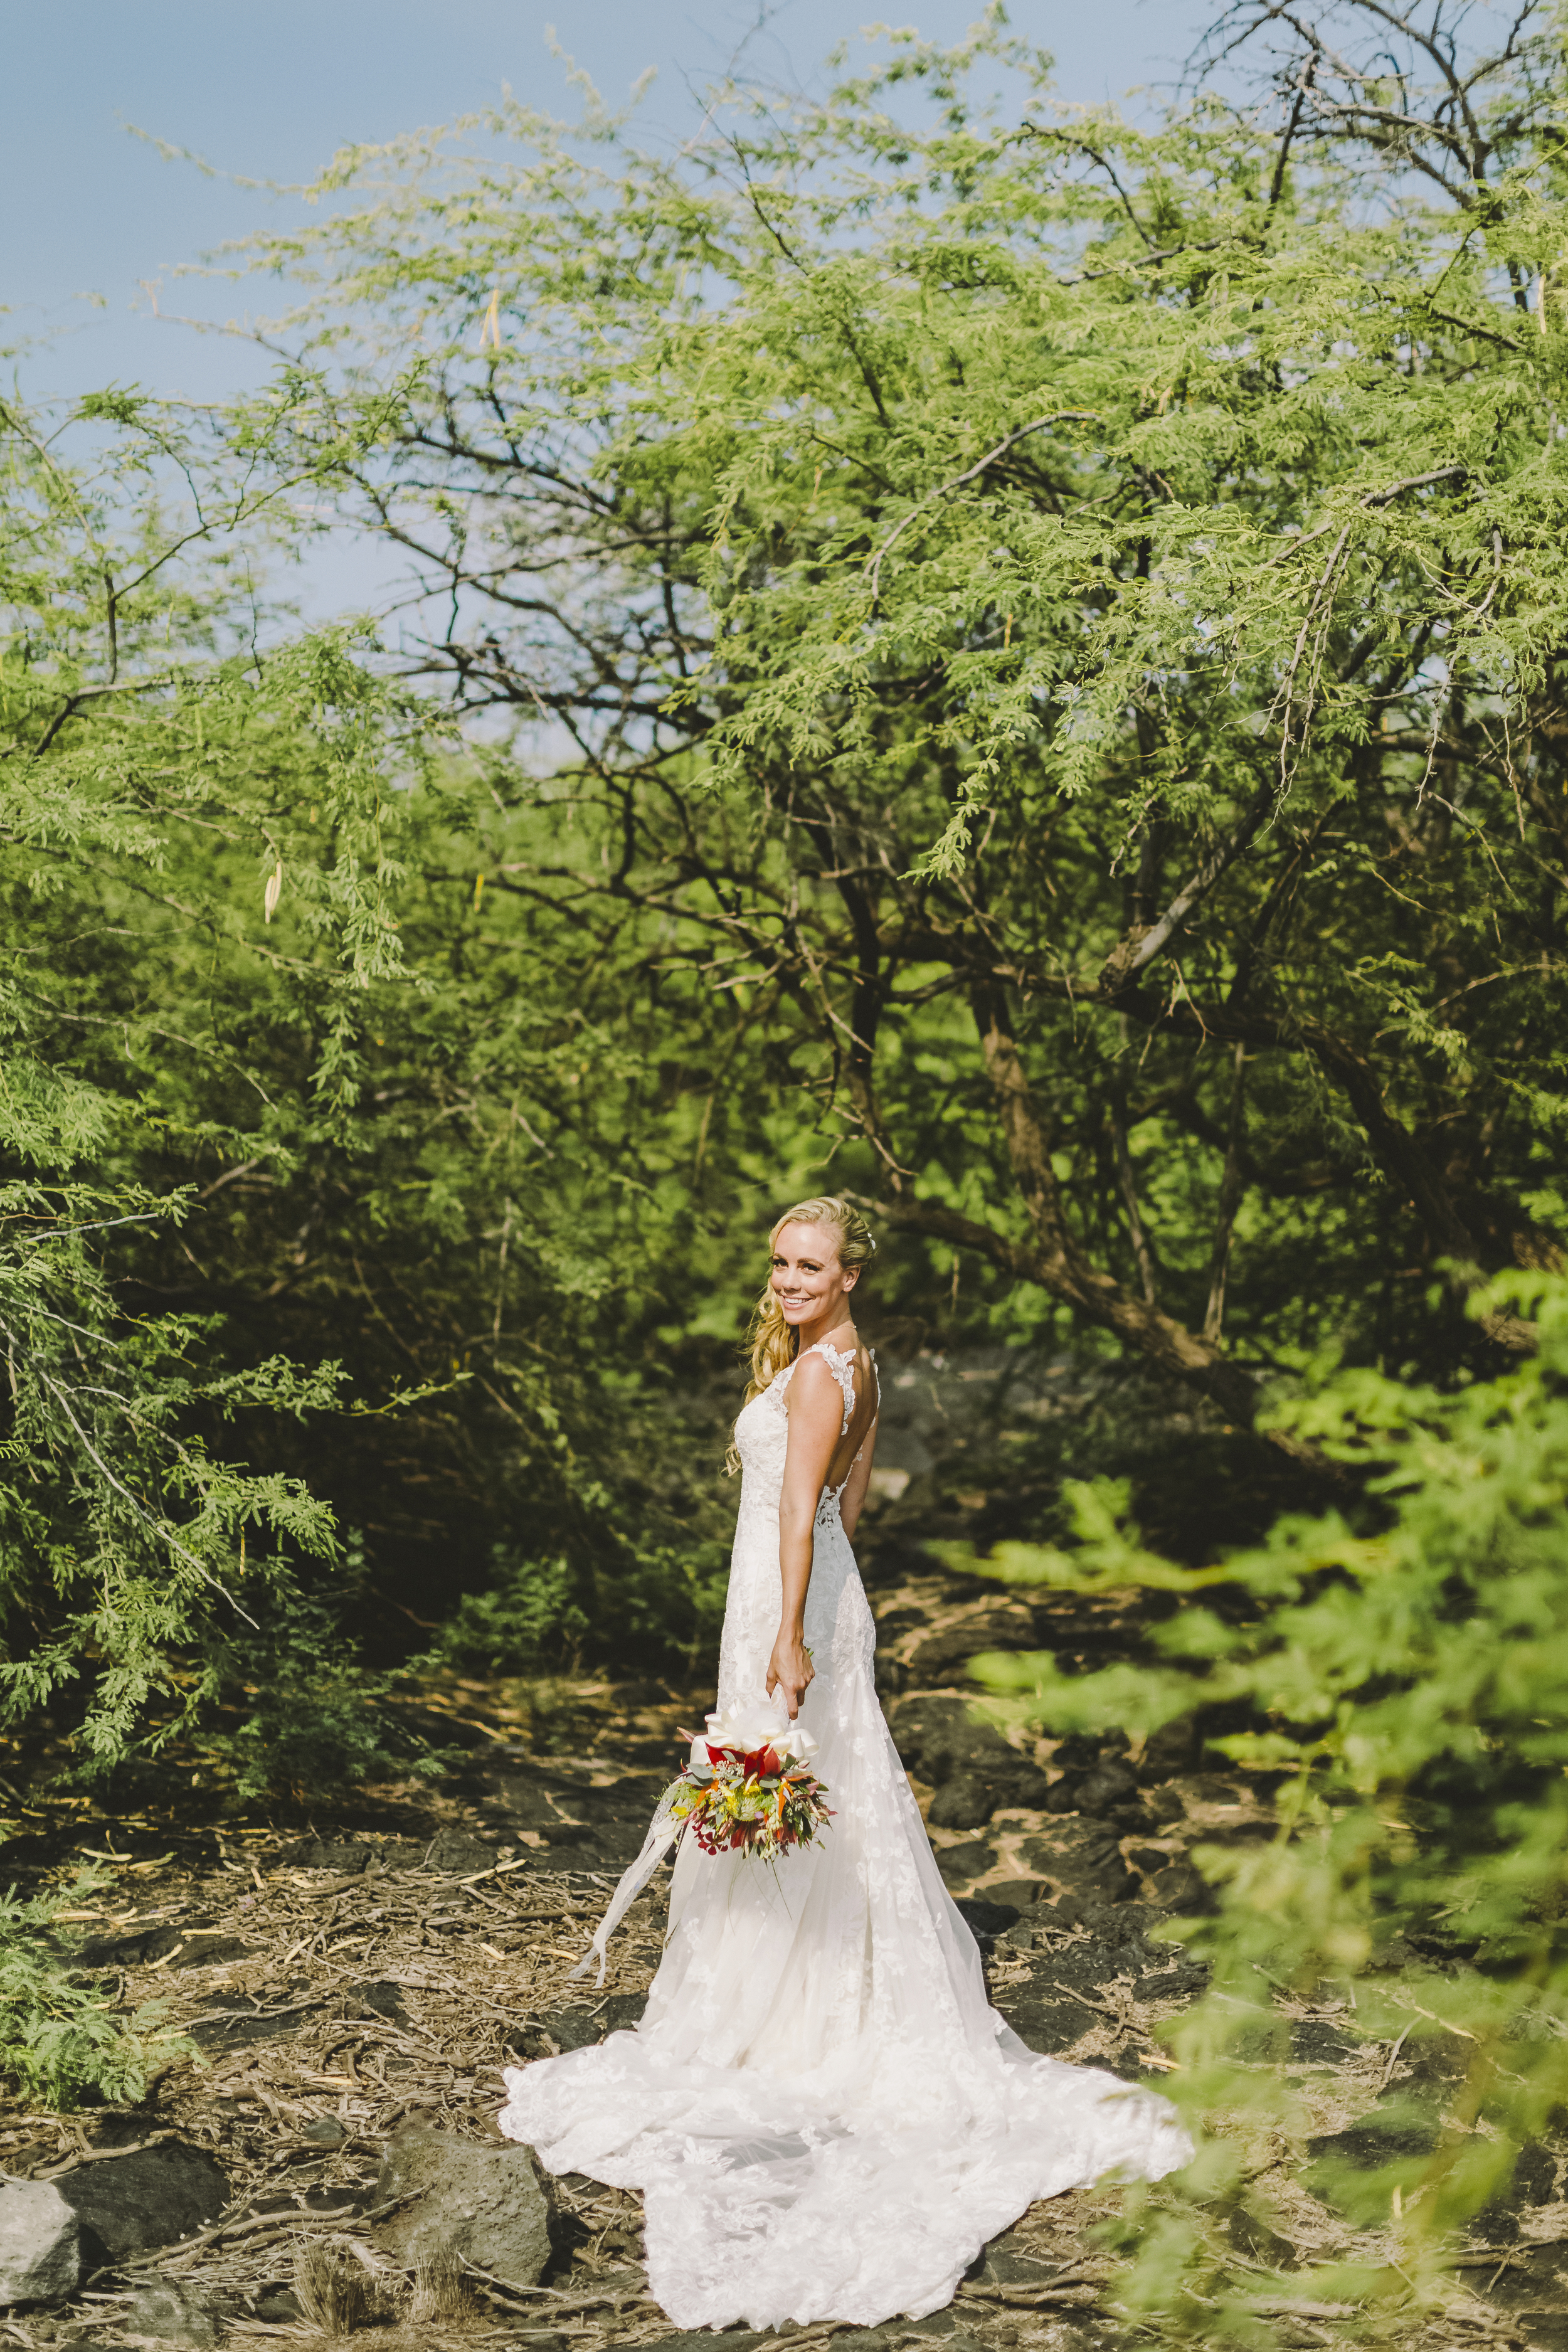 angie-diaz-photography-hawaii-wedding-photographer-kelli-jay-35.jpg